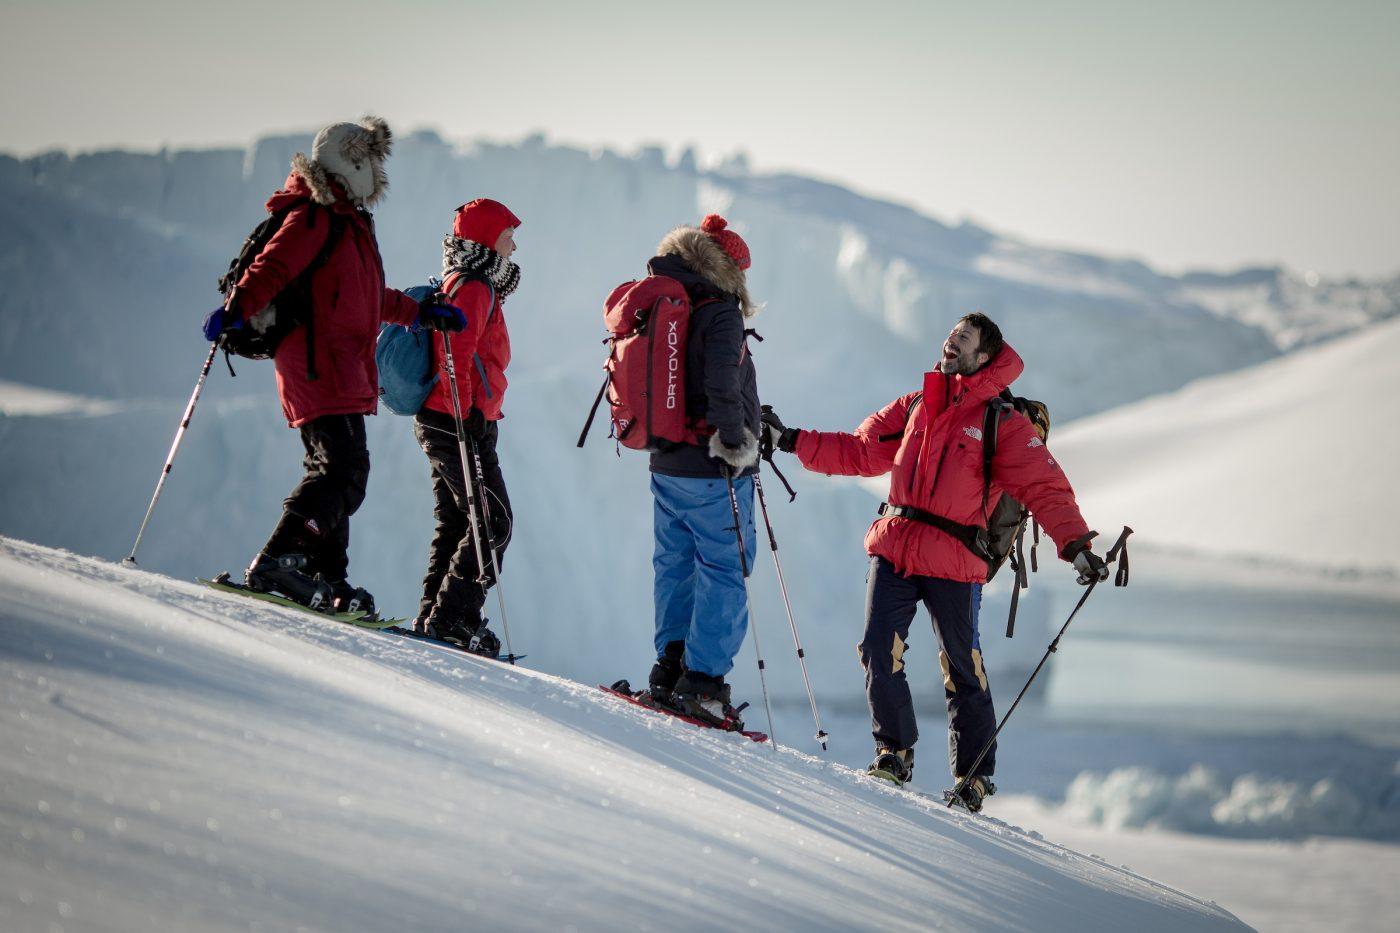 Photo by Mads Pihl - Visit Greenland